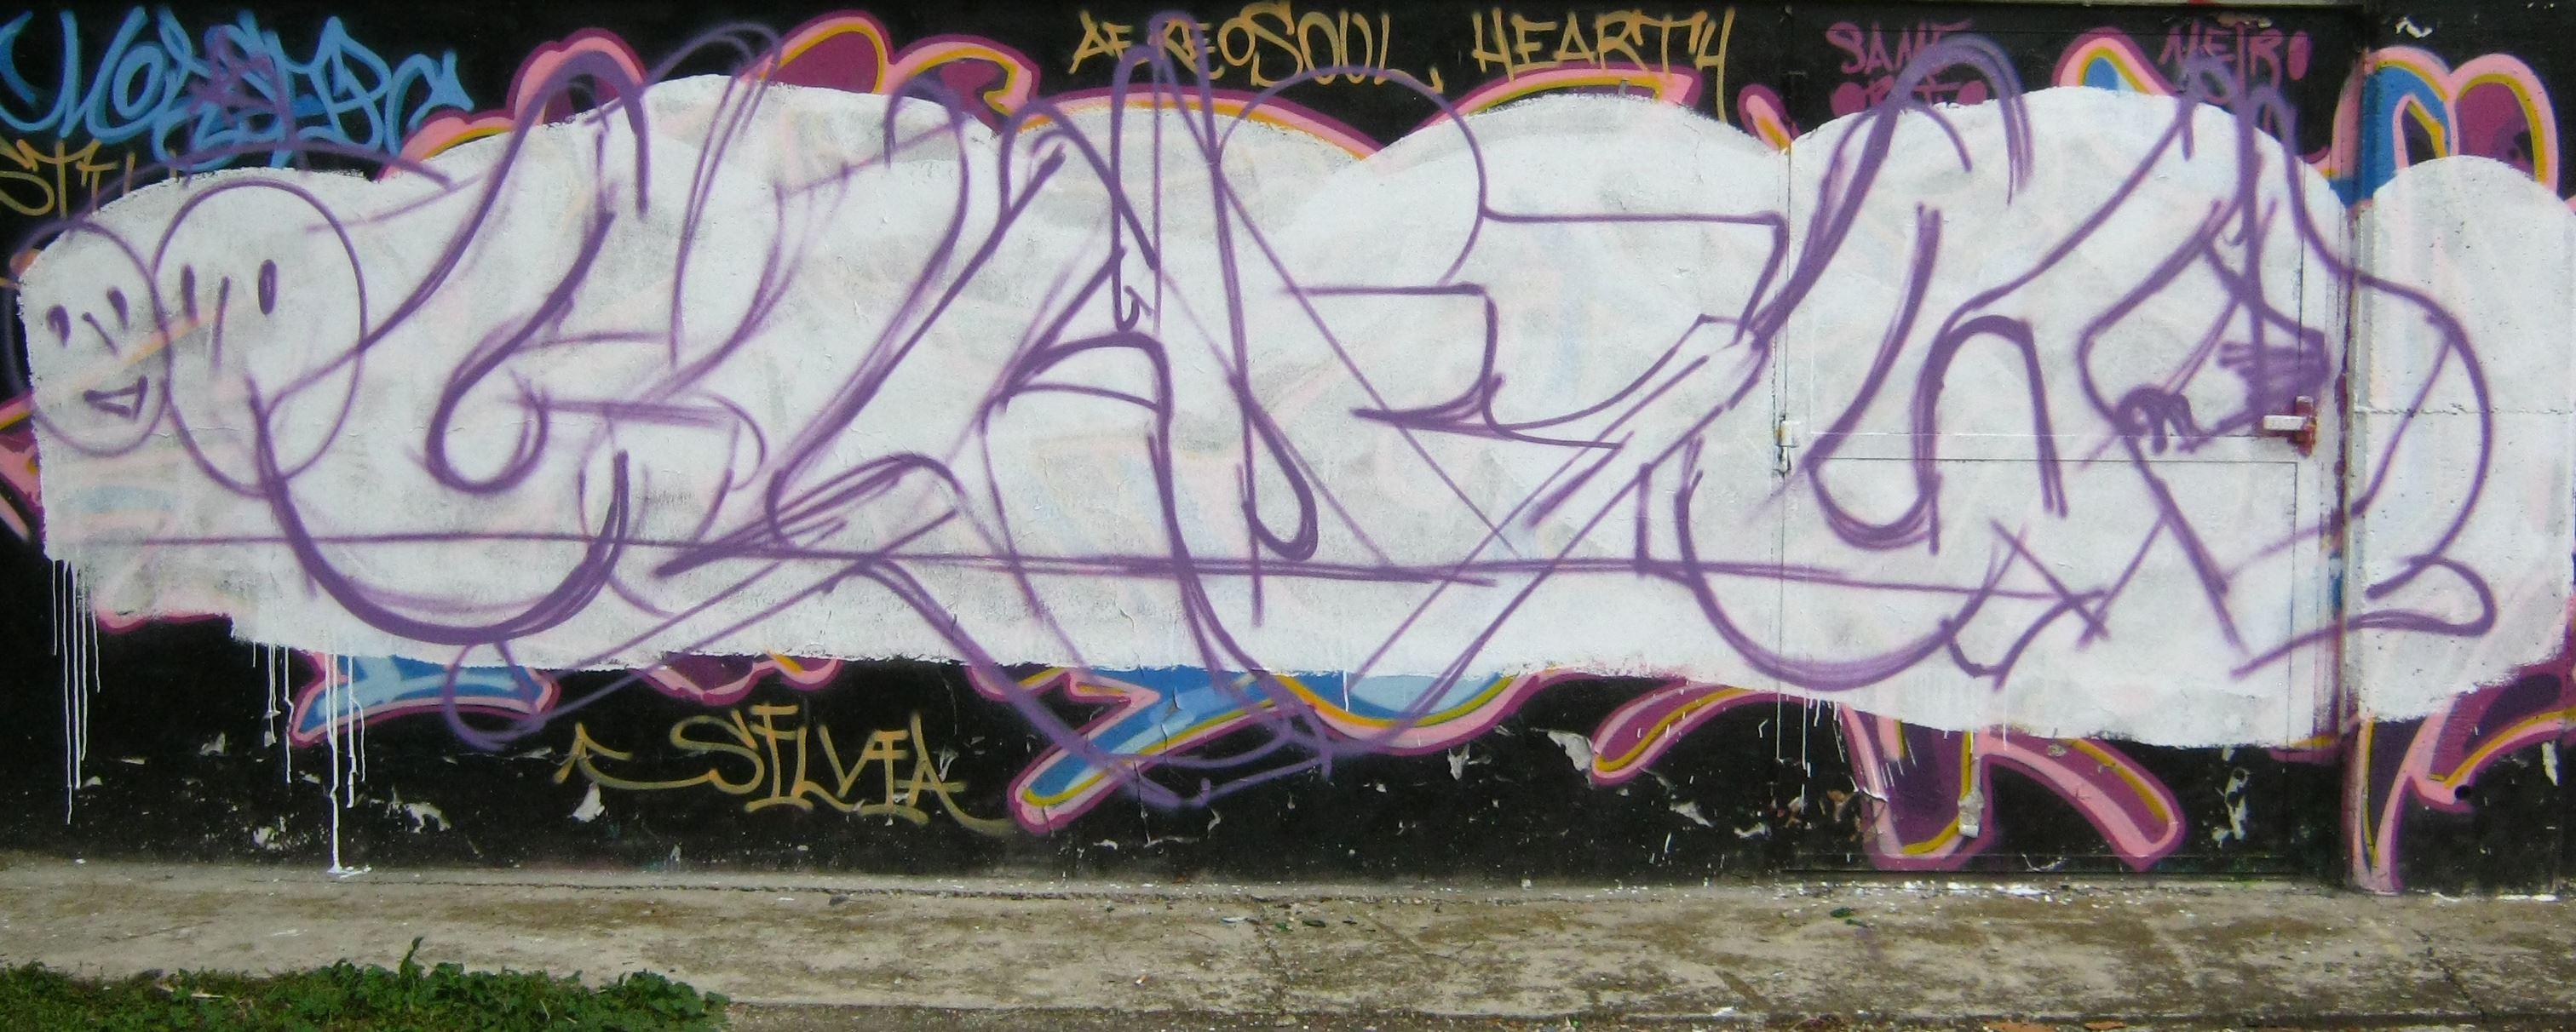 ClaRco franzRoom.net - graffiti matrimoniali - tracciA